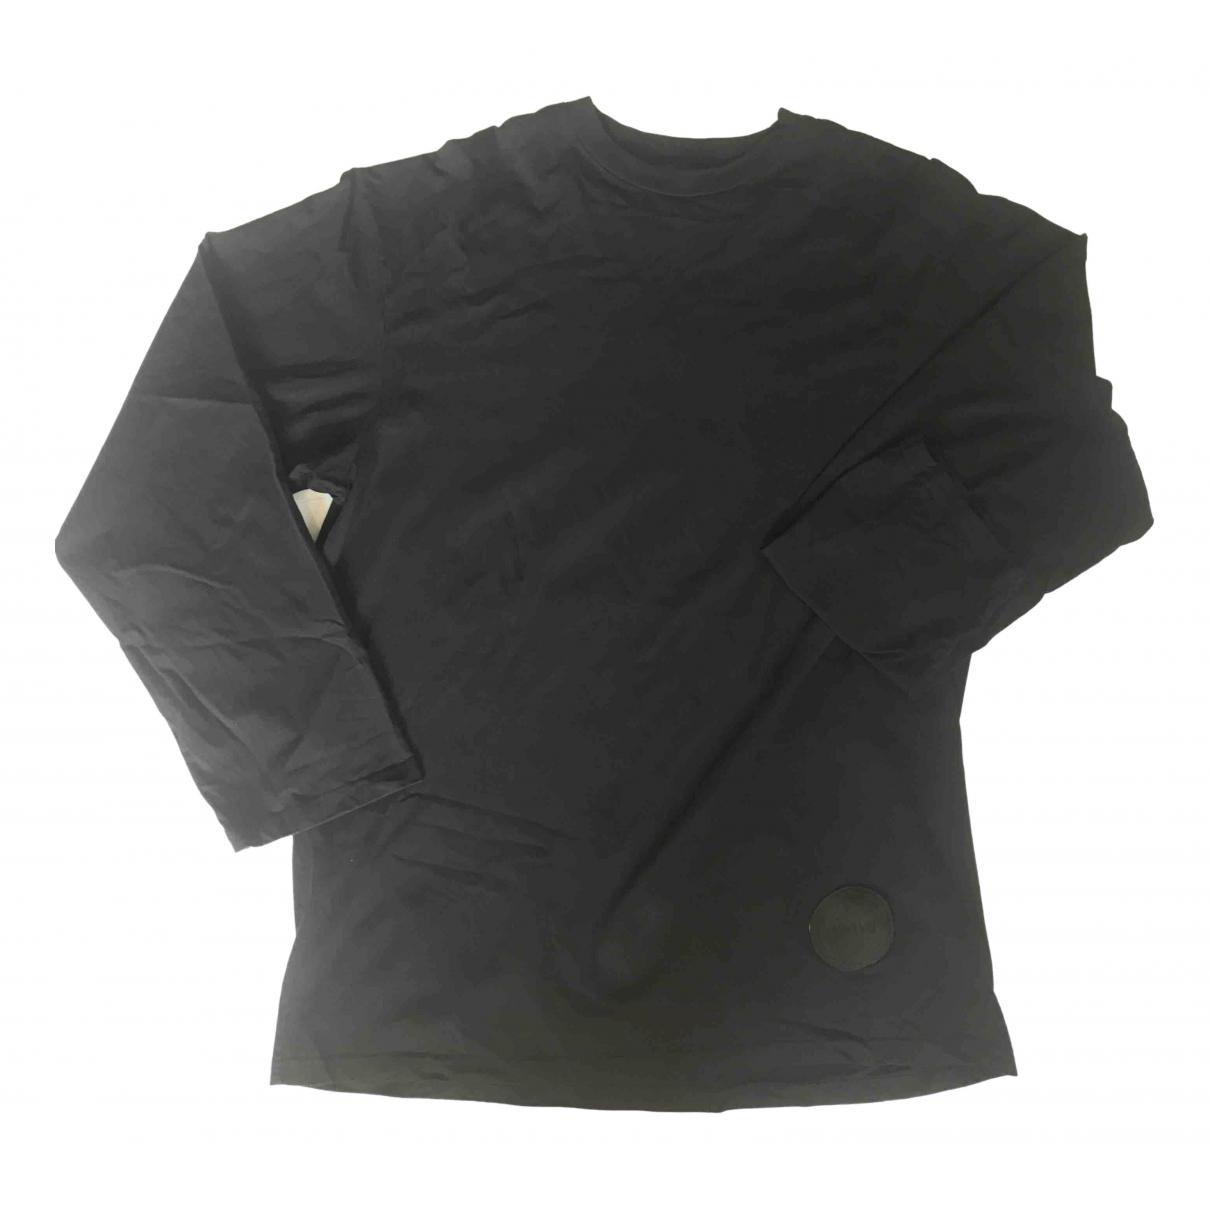 Yang Li \N Black Cotton T-shirts for Men M International